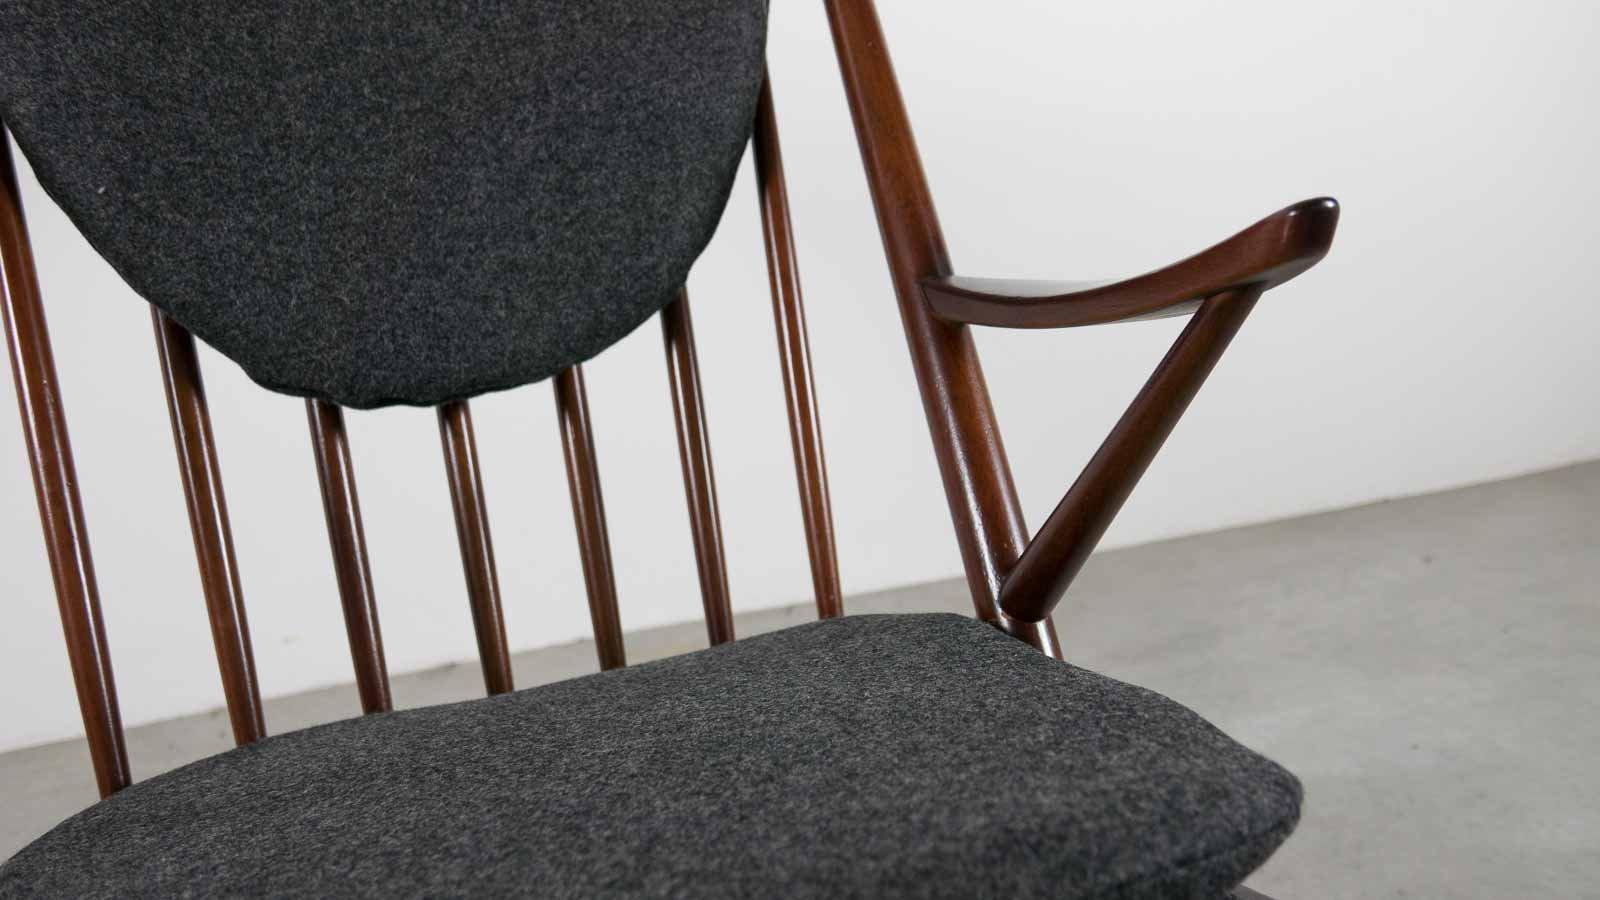 Frank reenskaug rocking chair - Mid Century 182 Rocking Chair By Frank Reenskaug For Bramin